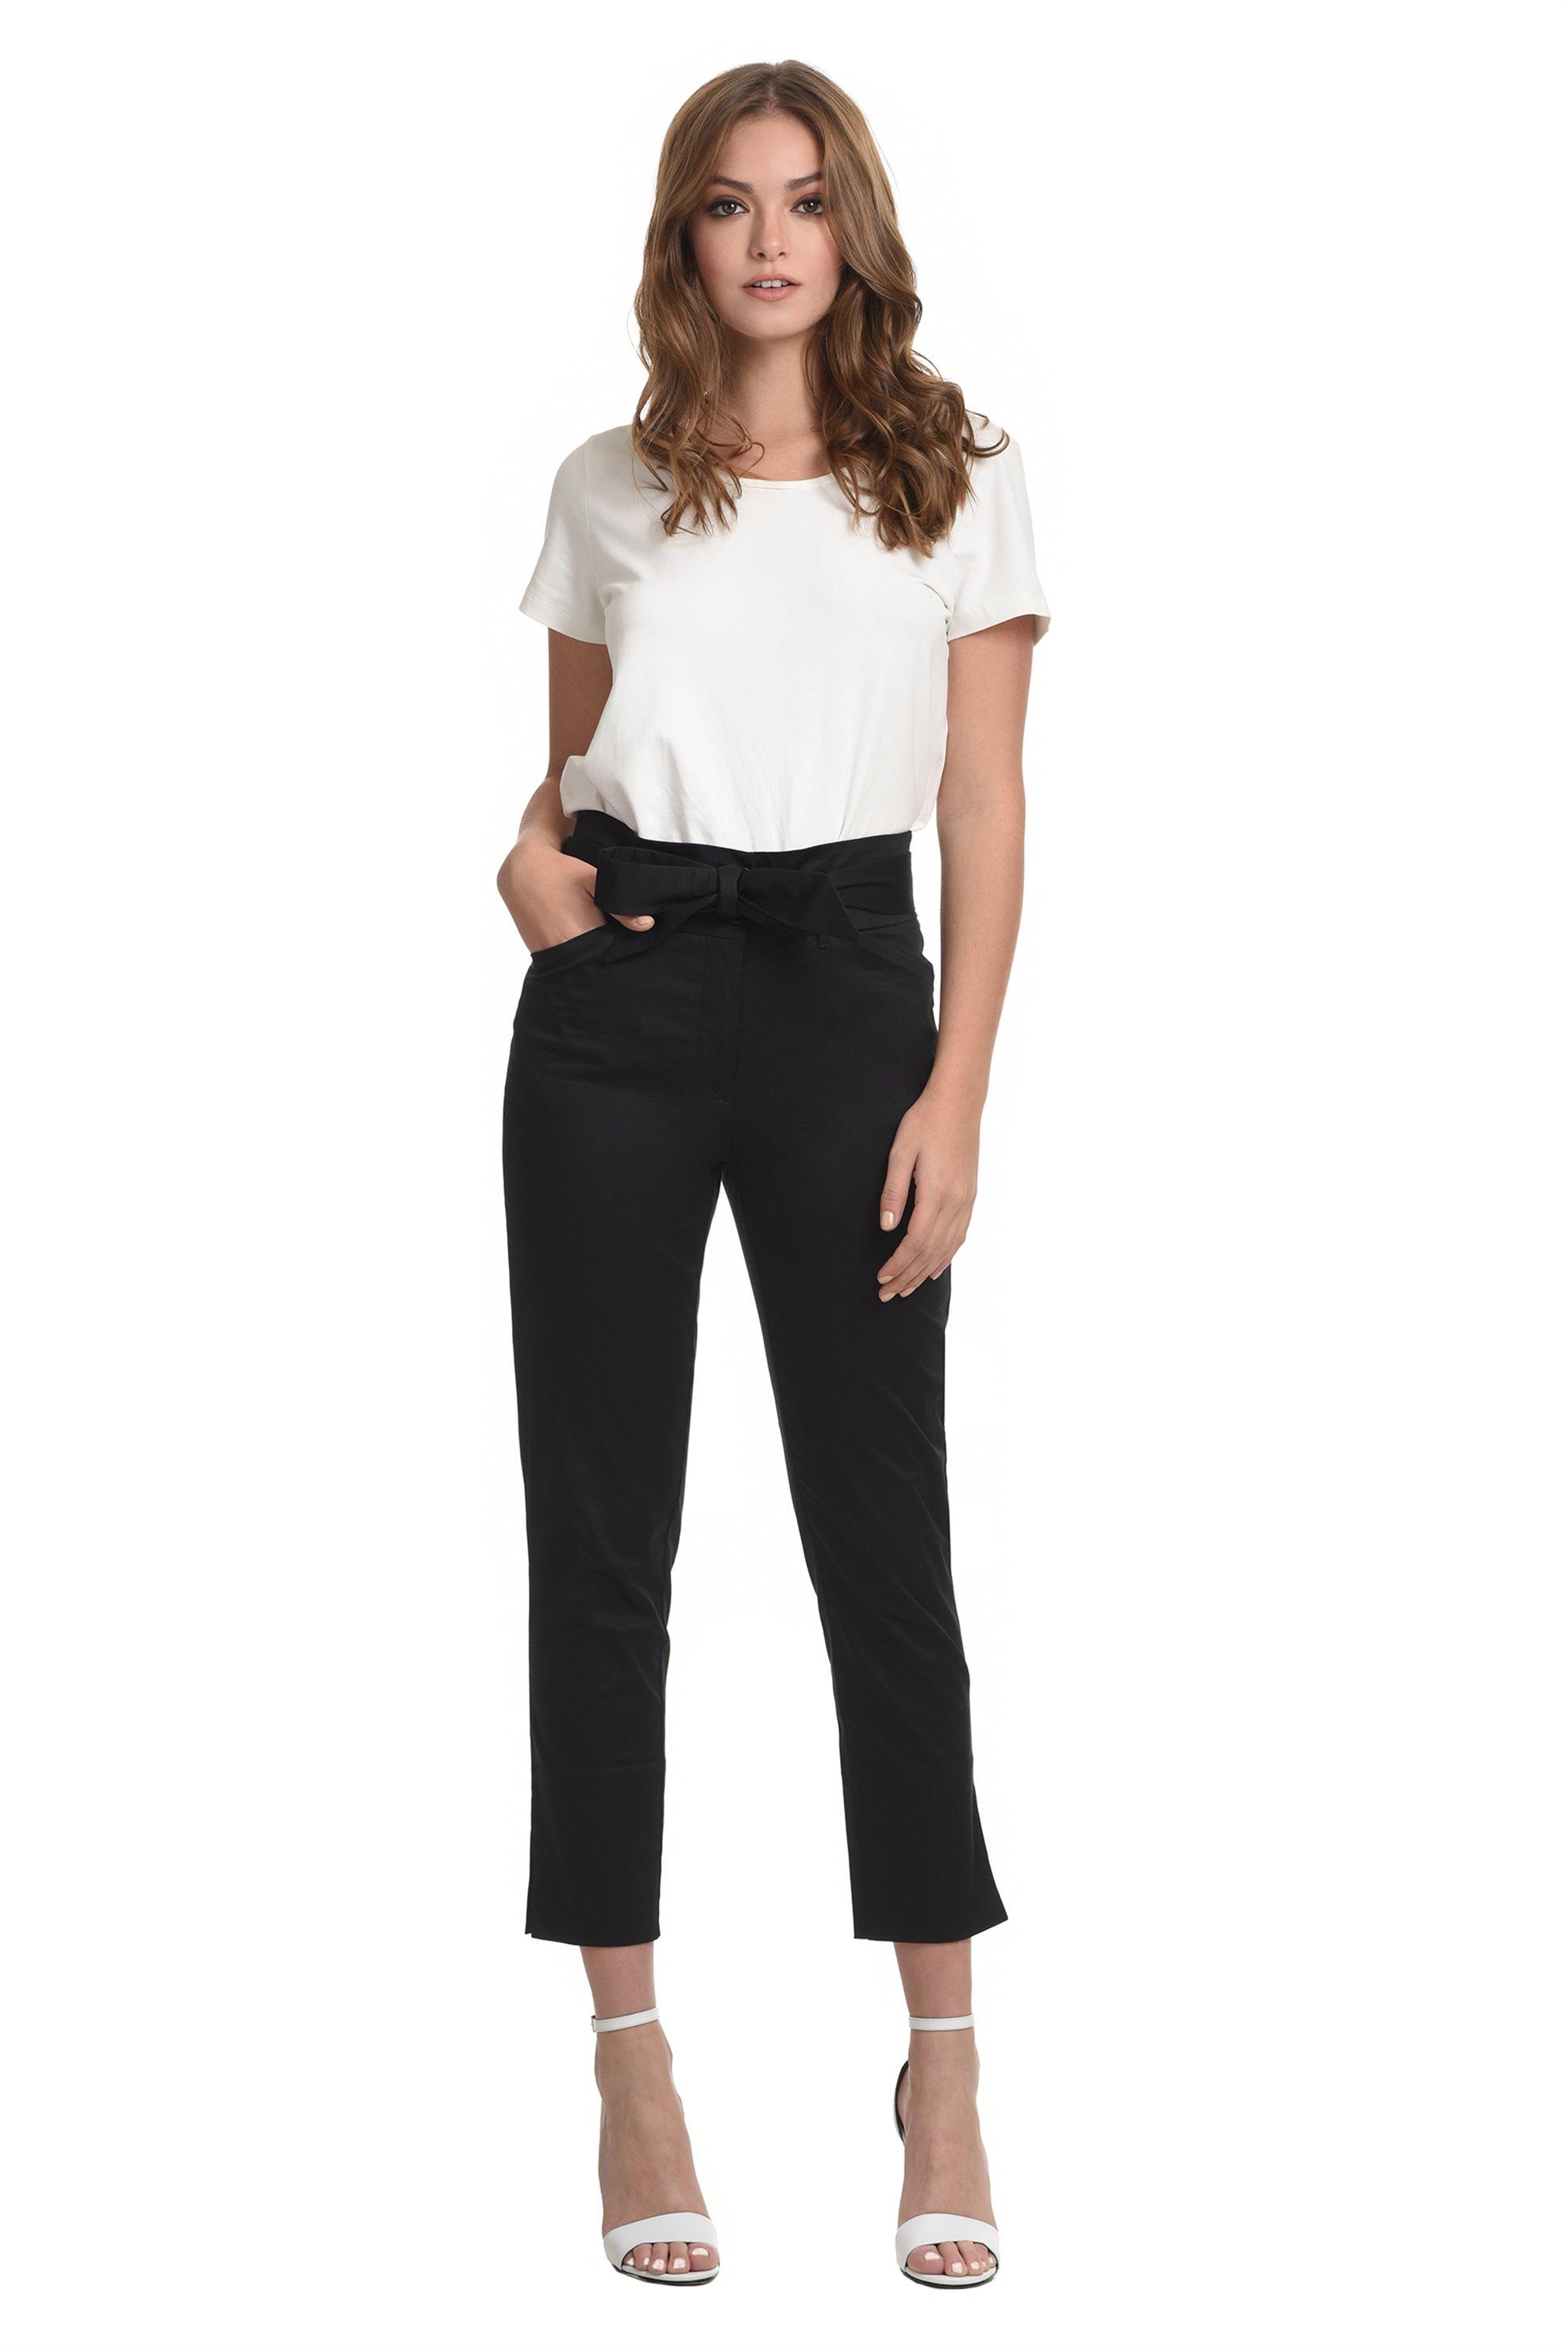 Sarah Lawrence Jeans γυναικείο υφασμάτινο παντελόνι ψηλόμεσο με ζώνη - 2-900066  γυναικα   ρουχα   παντελόνια   slim